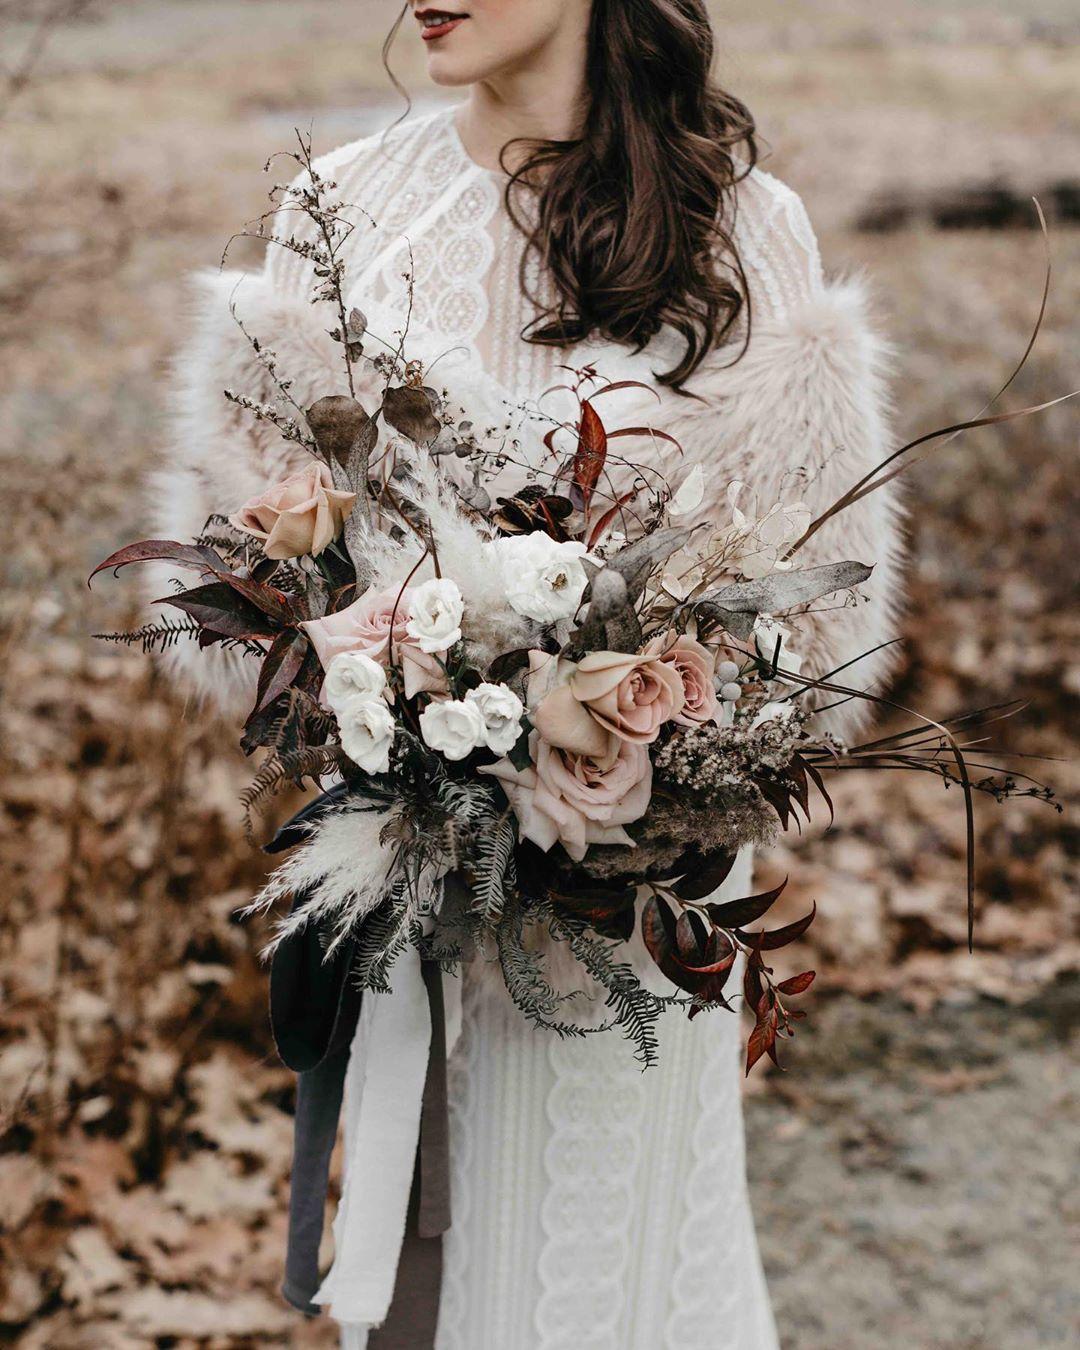 {love•ly} photo | @jessjolinphotography  design/planning | @nicolemowerevents . . #bride #bouquet #weddingday #fallwedding #cozyvibes #moody #romantic #thoselips #nhwedding #lotusfloraldesigns  #weddingflowers #weddingdesign #love #ido #forever